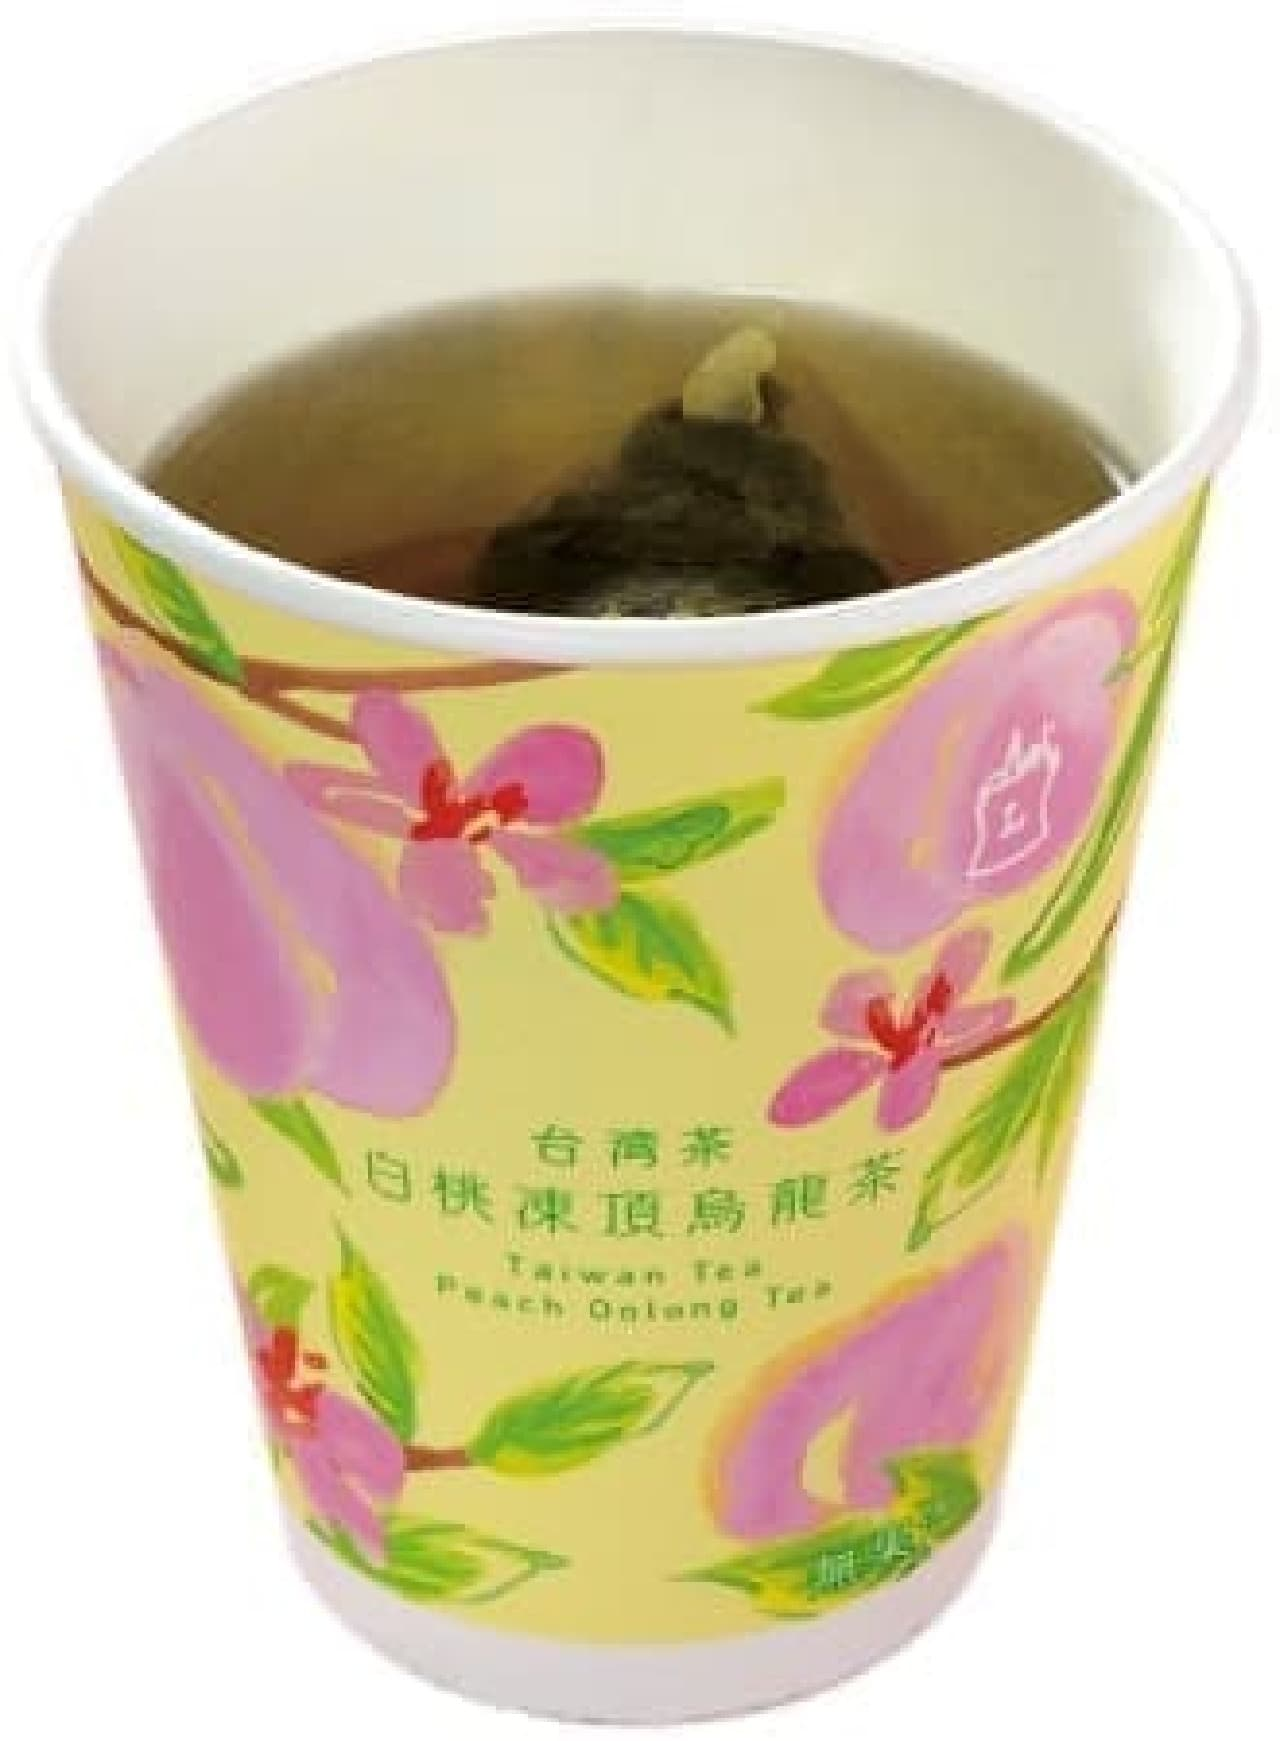 ローソン「MACHI cafe 台湾茶 白桃凍頂烏龍茶(無果汁)」